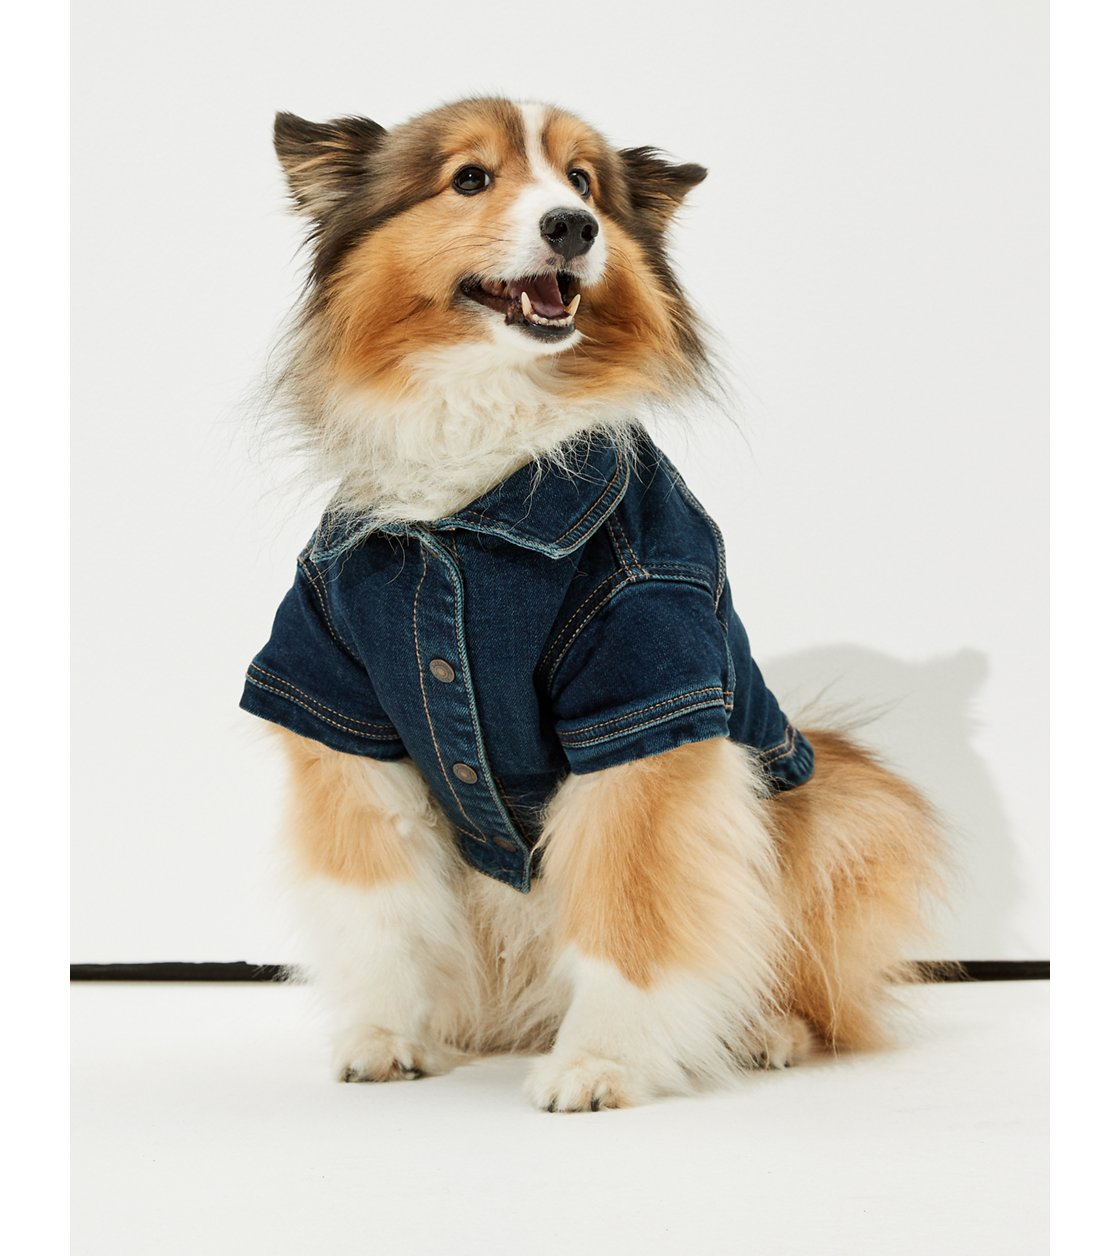 American Eagle ABO Doggy Denim Jacket